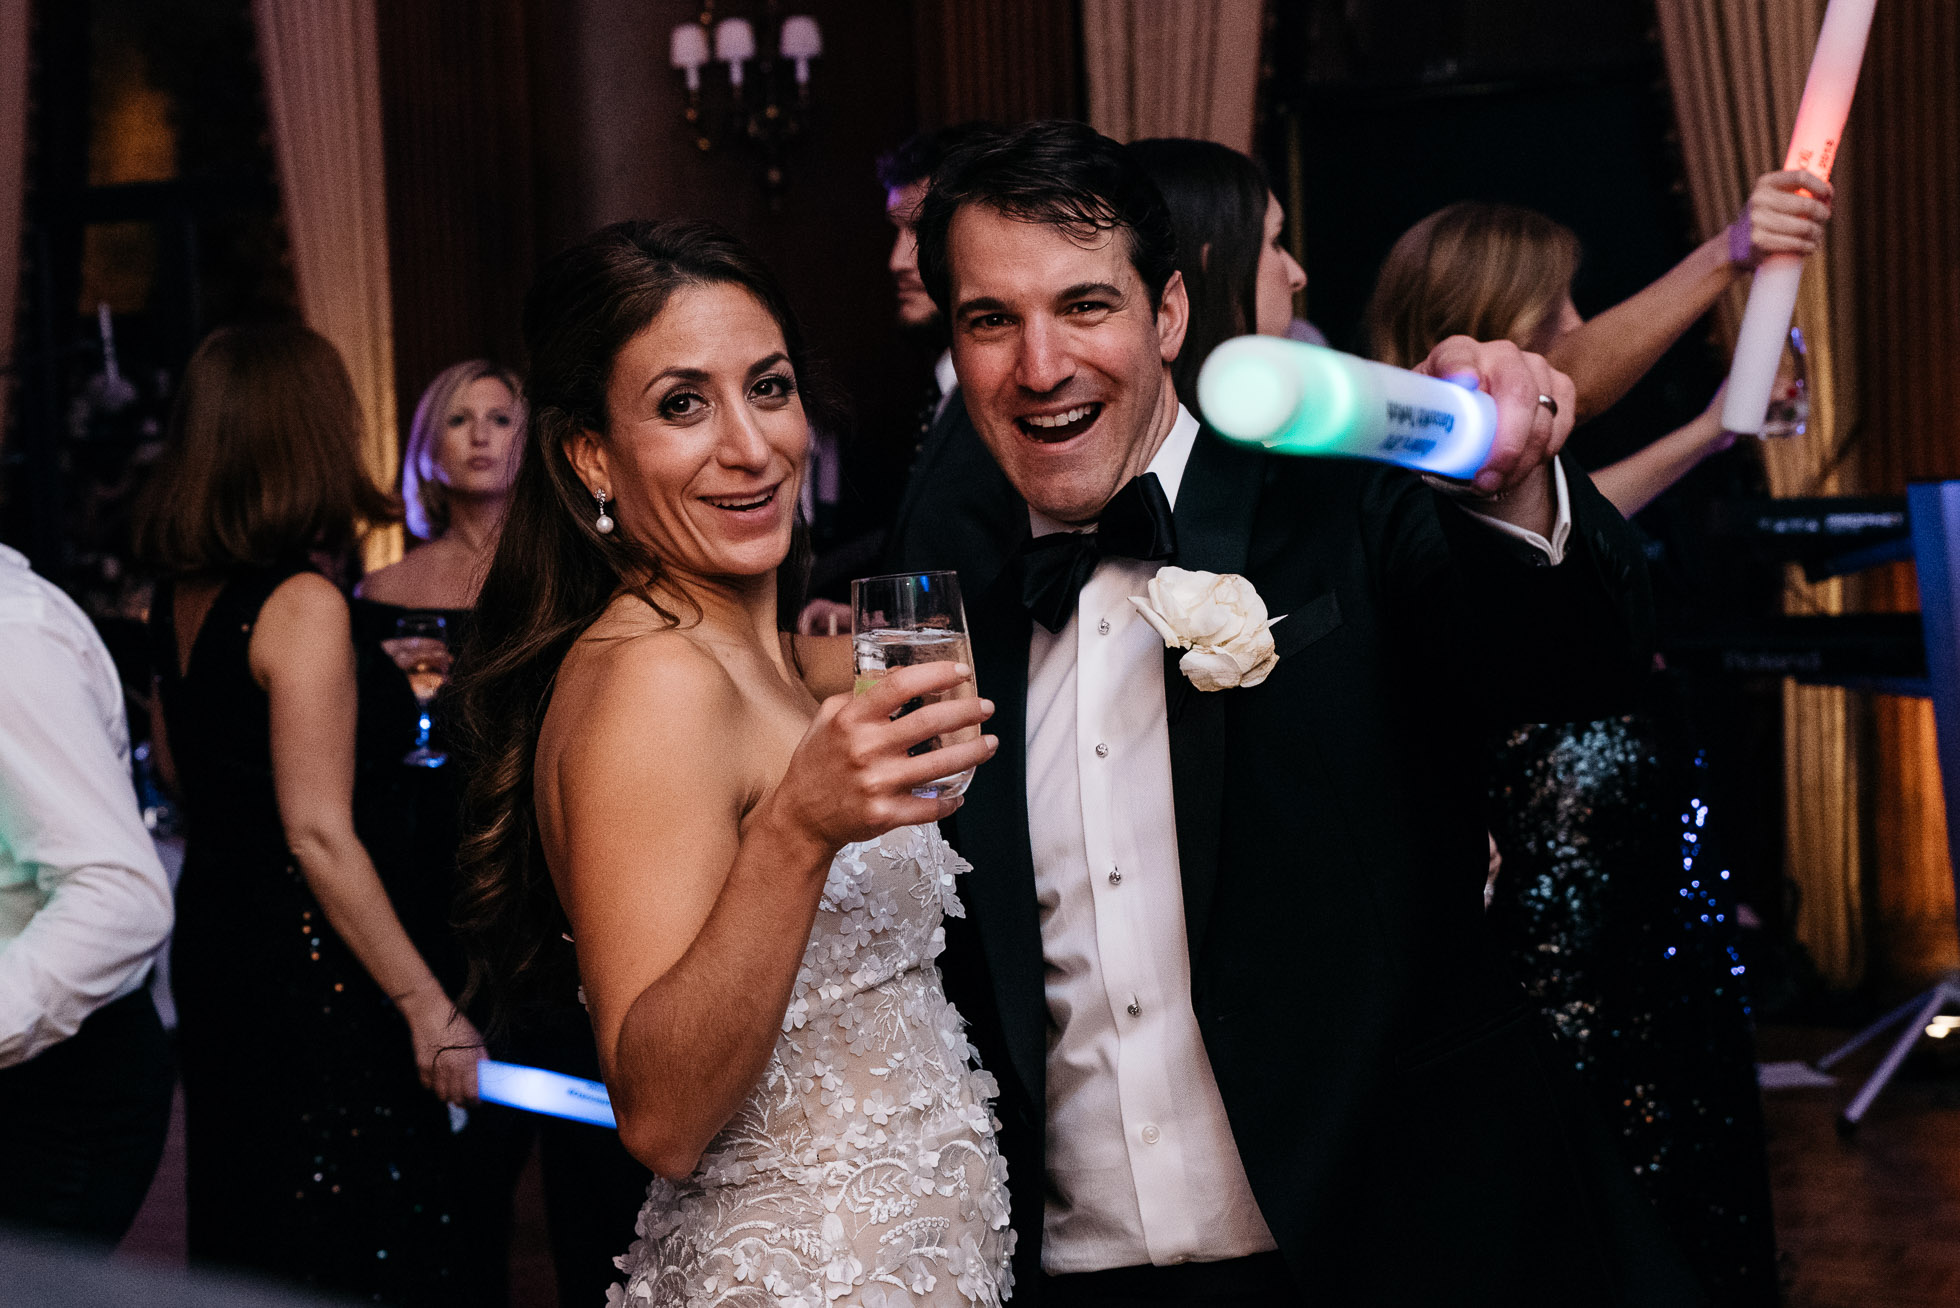 Duquesne Club Pittsburgh PA, Mariah Fisher, reception dancing, party-3.jpg